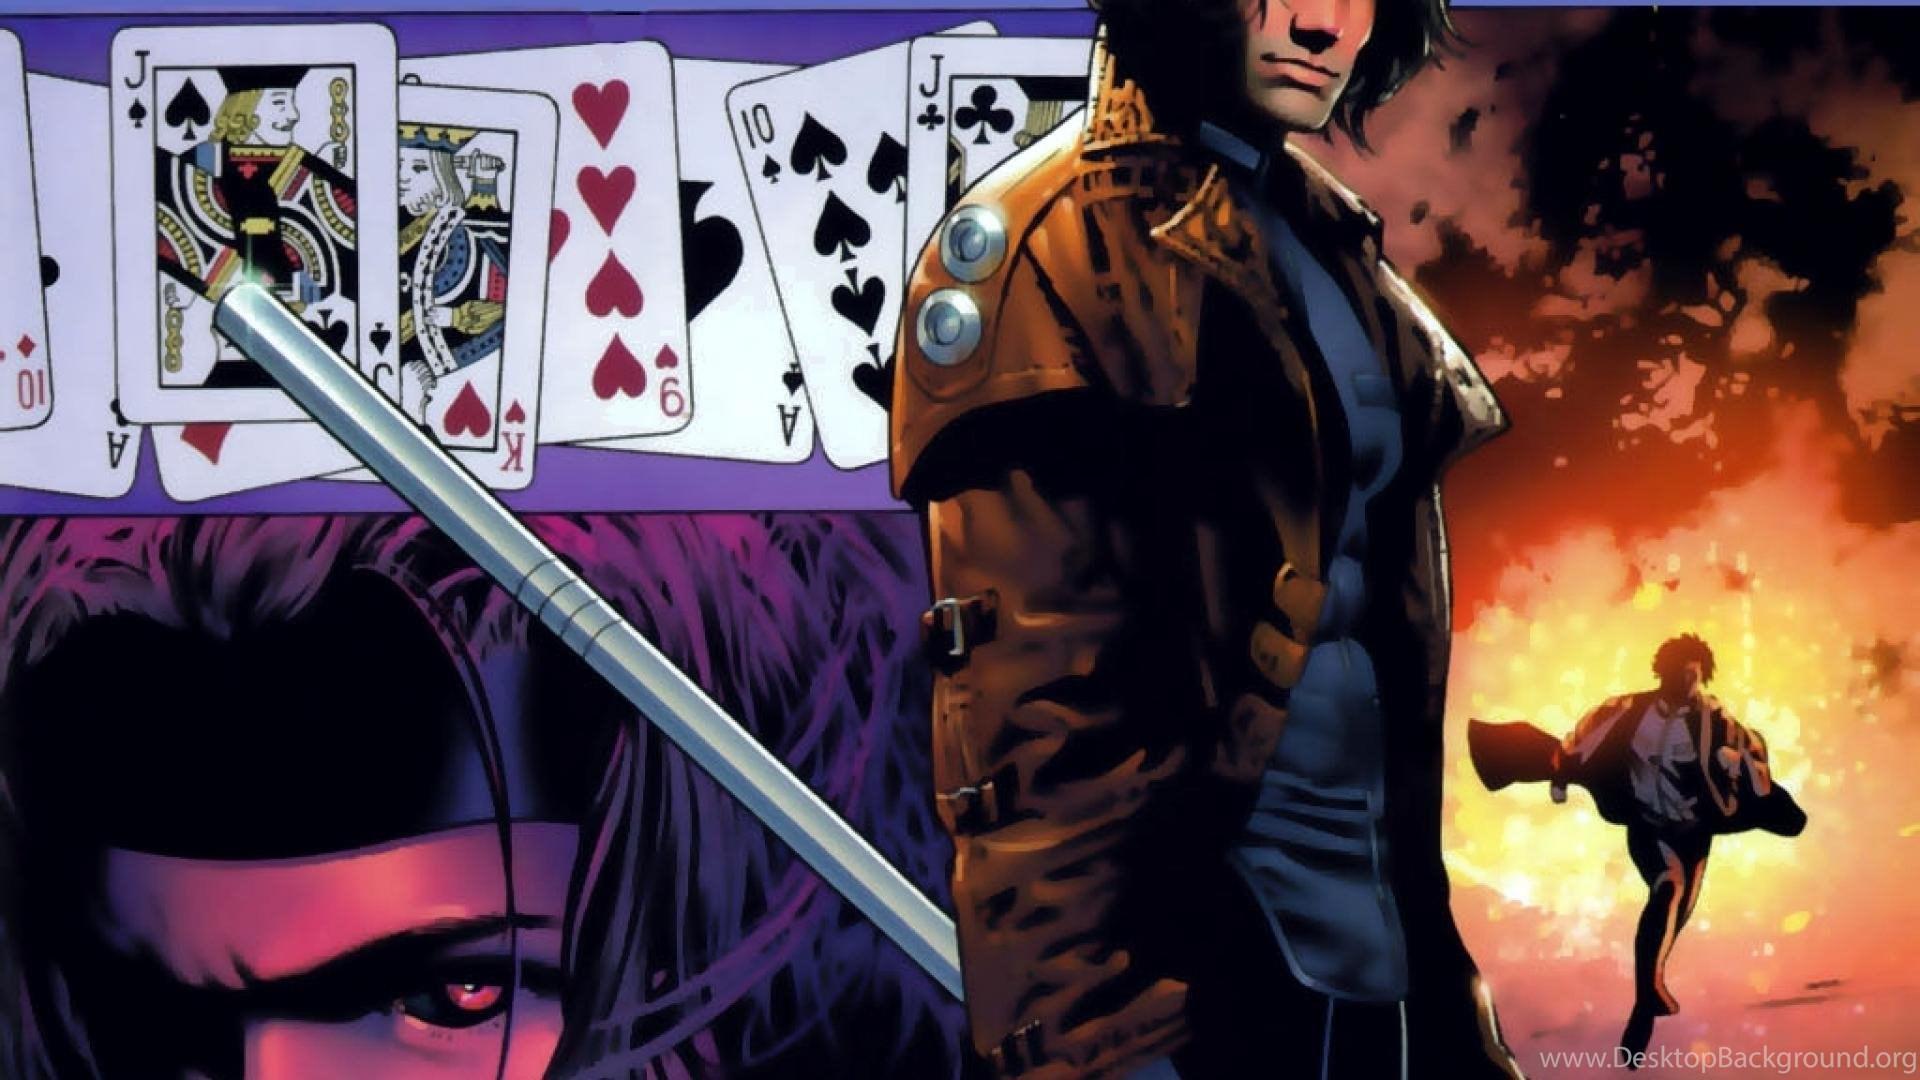 Download Wallpaper Marvel Xmen - 221587_gambit-marvel-comics-x-men-cards-comics-wallpapers_1920x1080_h  HD_435758.jpg